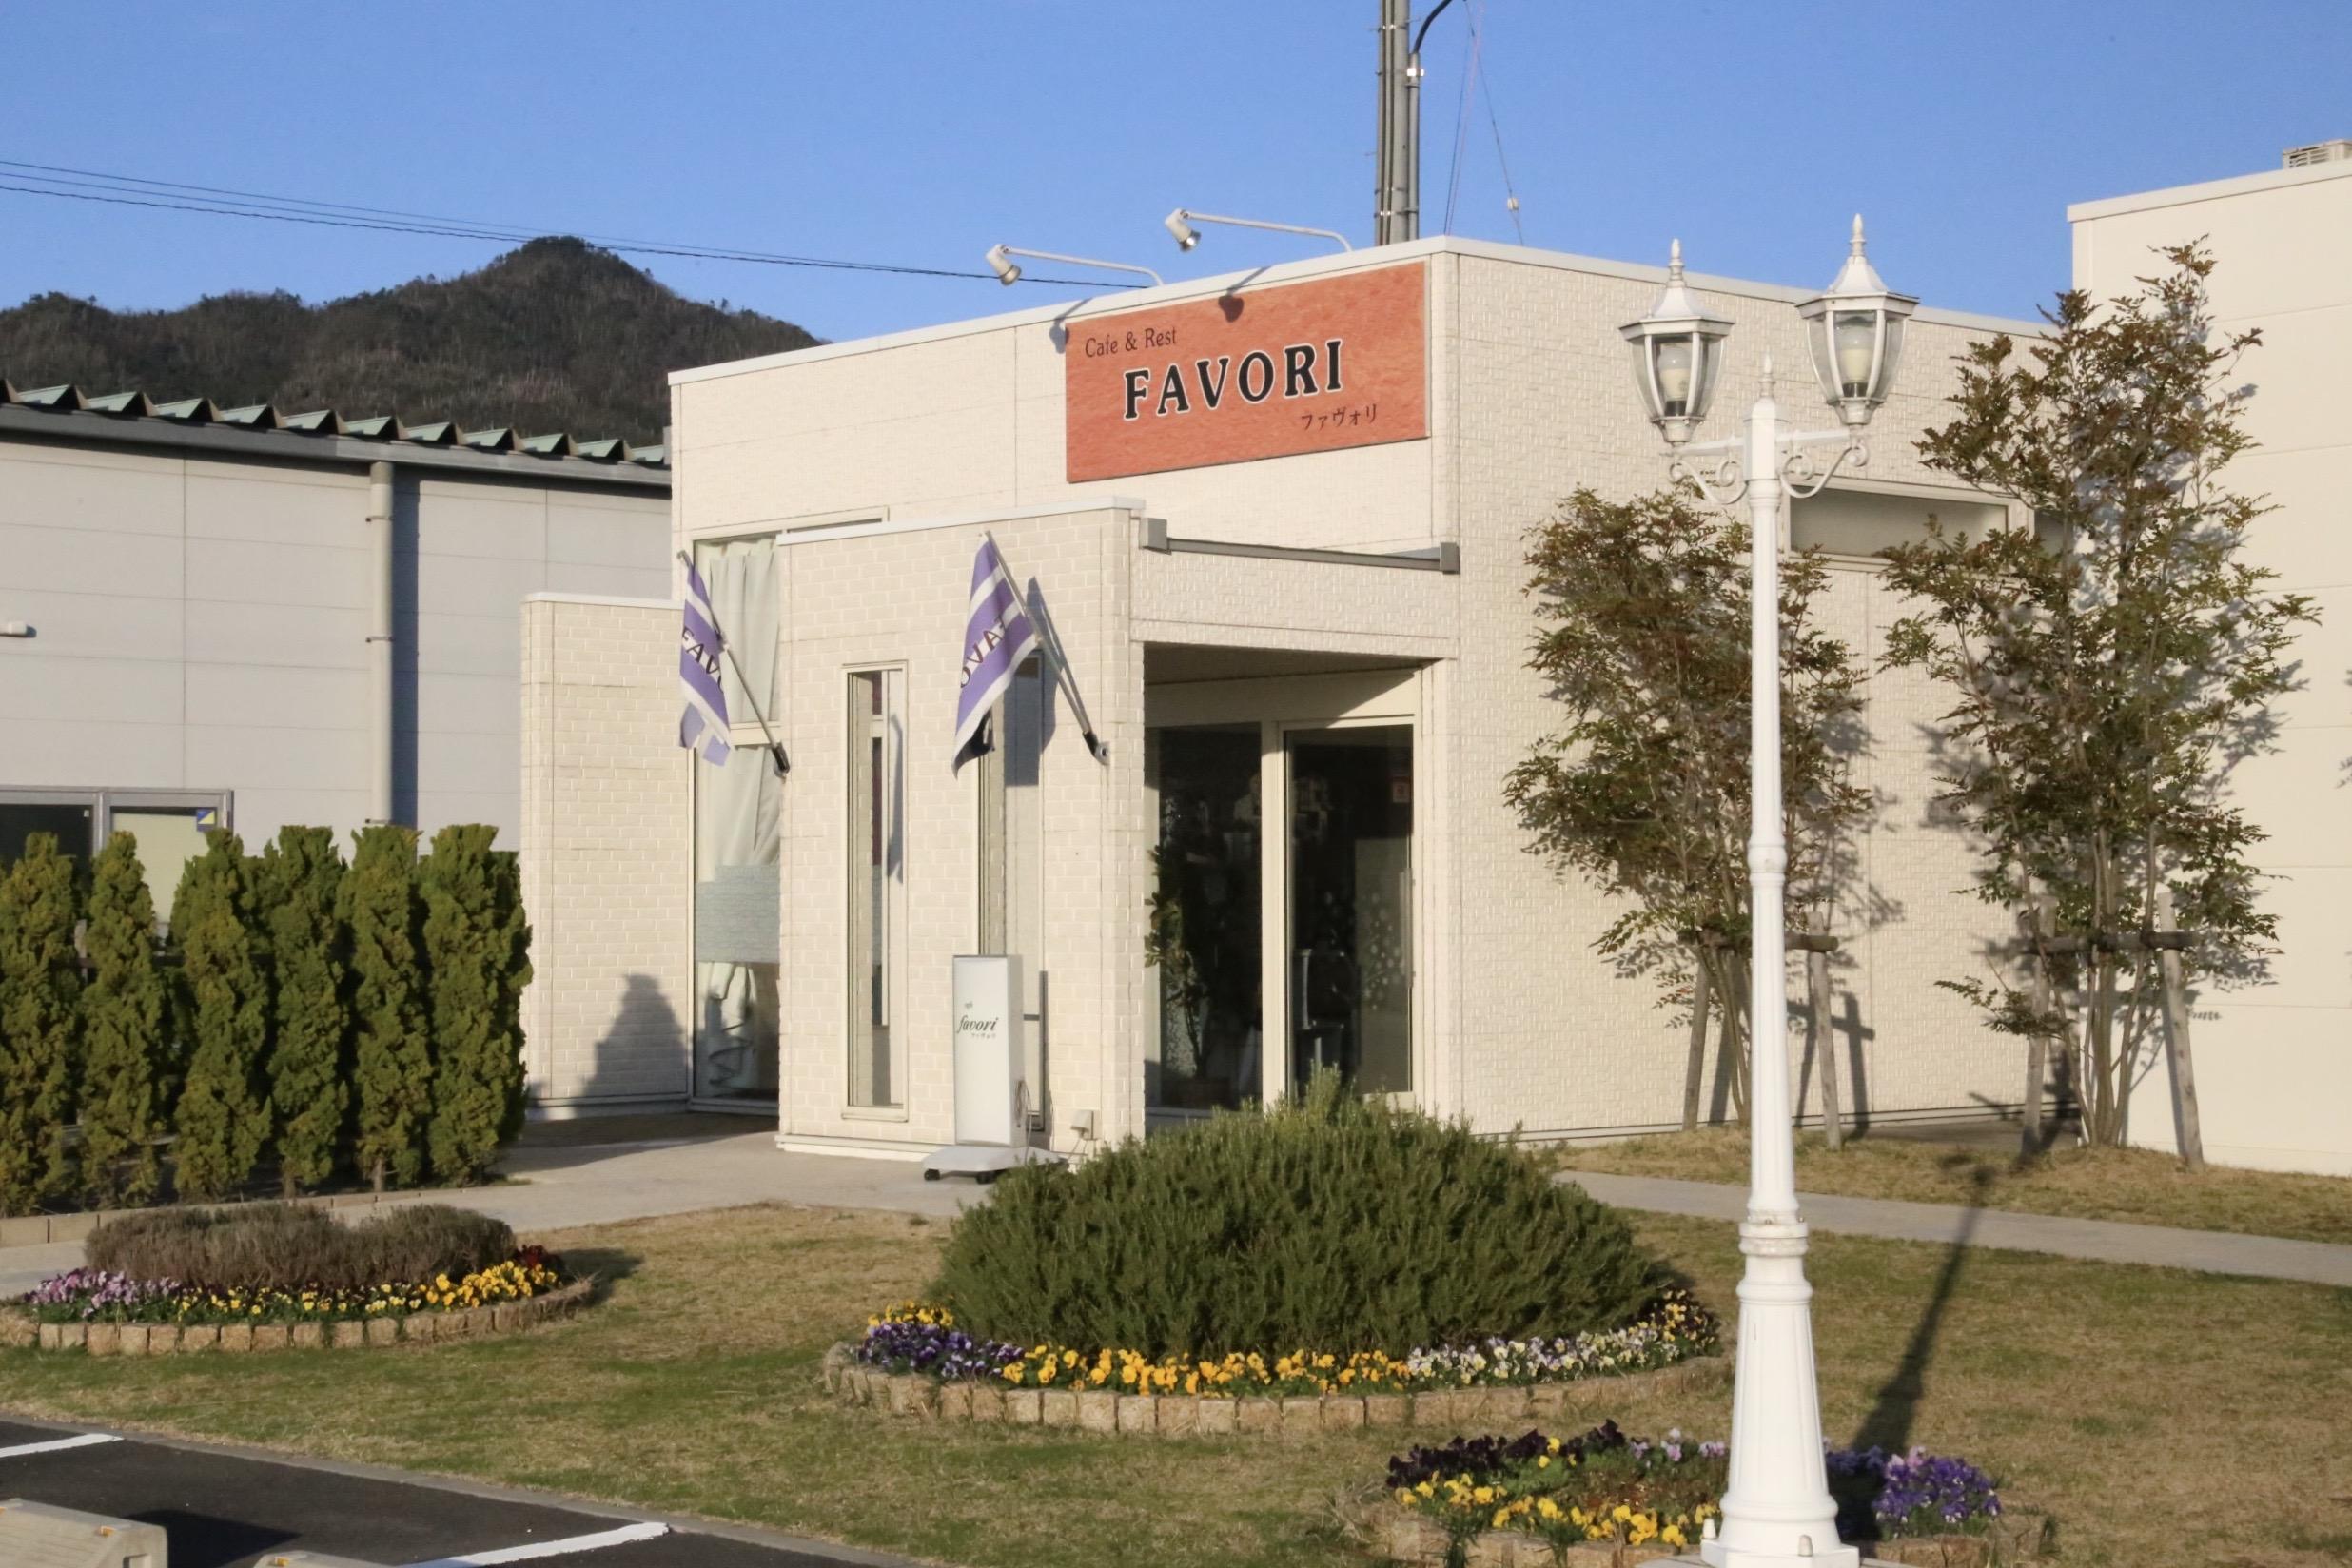 FAVORI(ファヴォリ)/レストラン(出雲・島根)